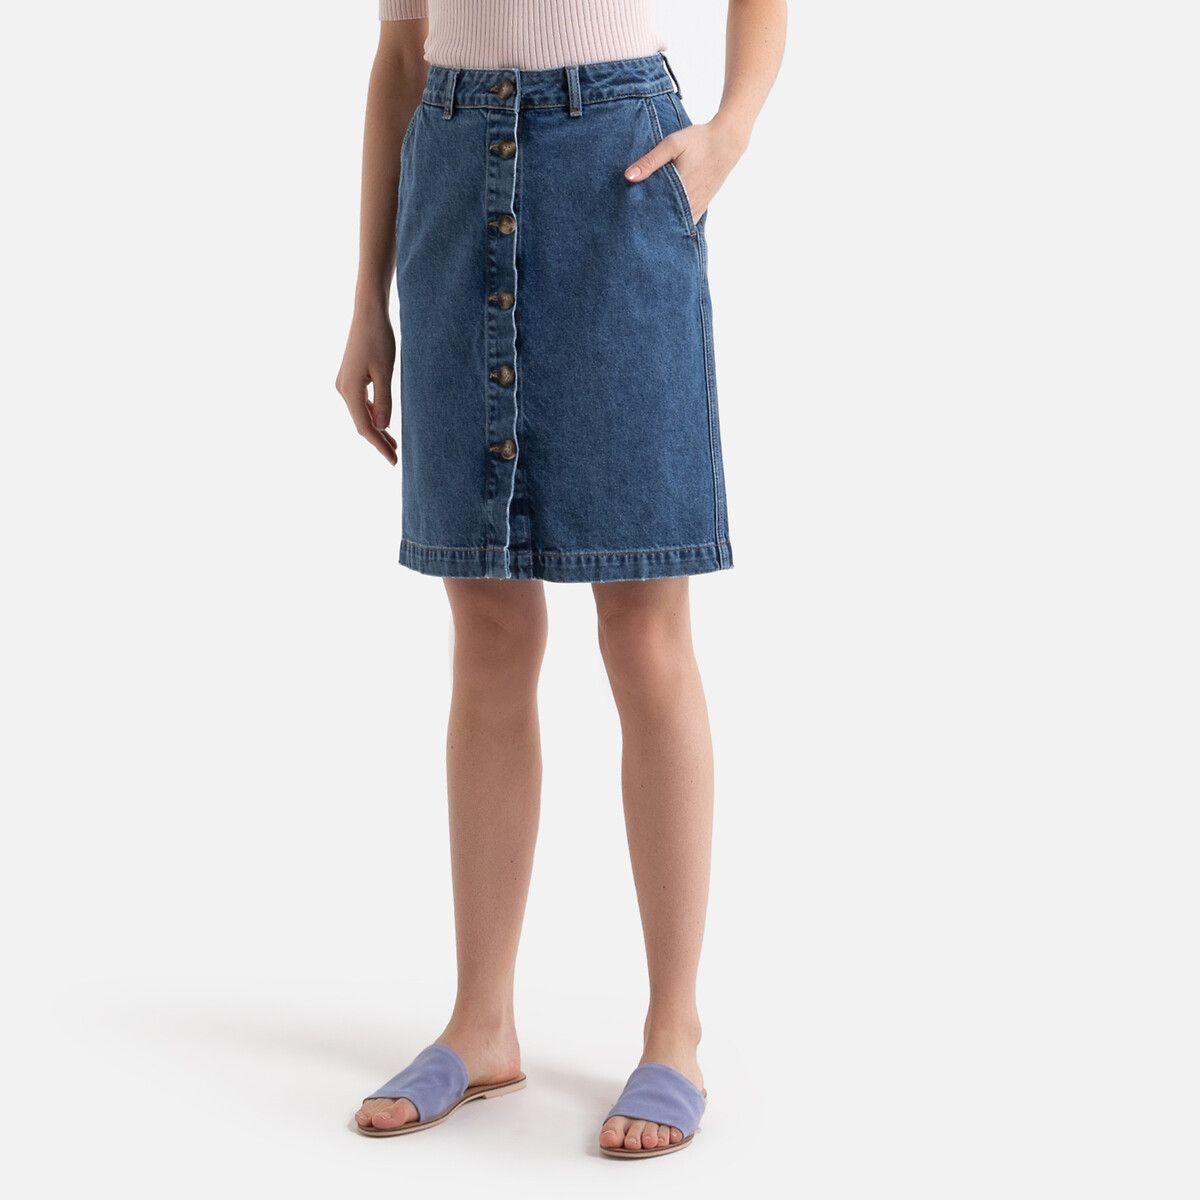 Jupe droite en jean